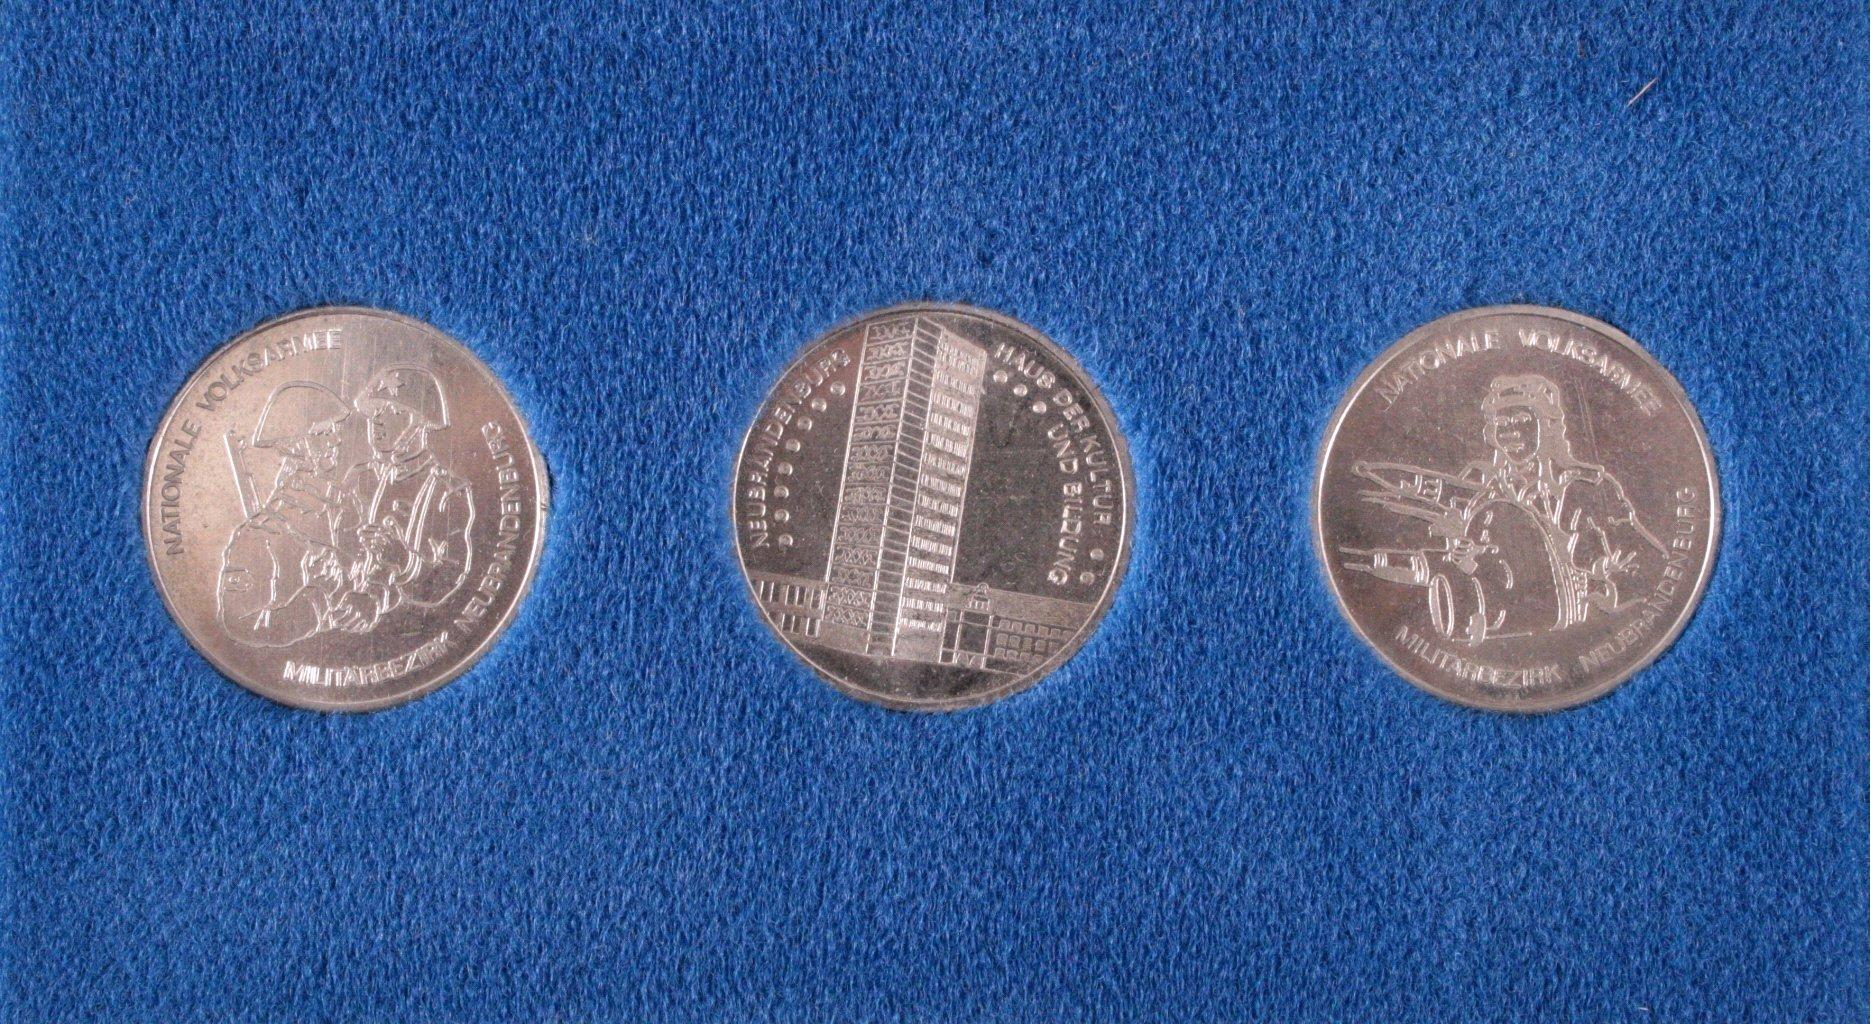 Medaillen NVA Militärbezirk Neubrandenburg